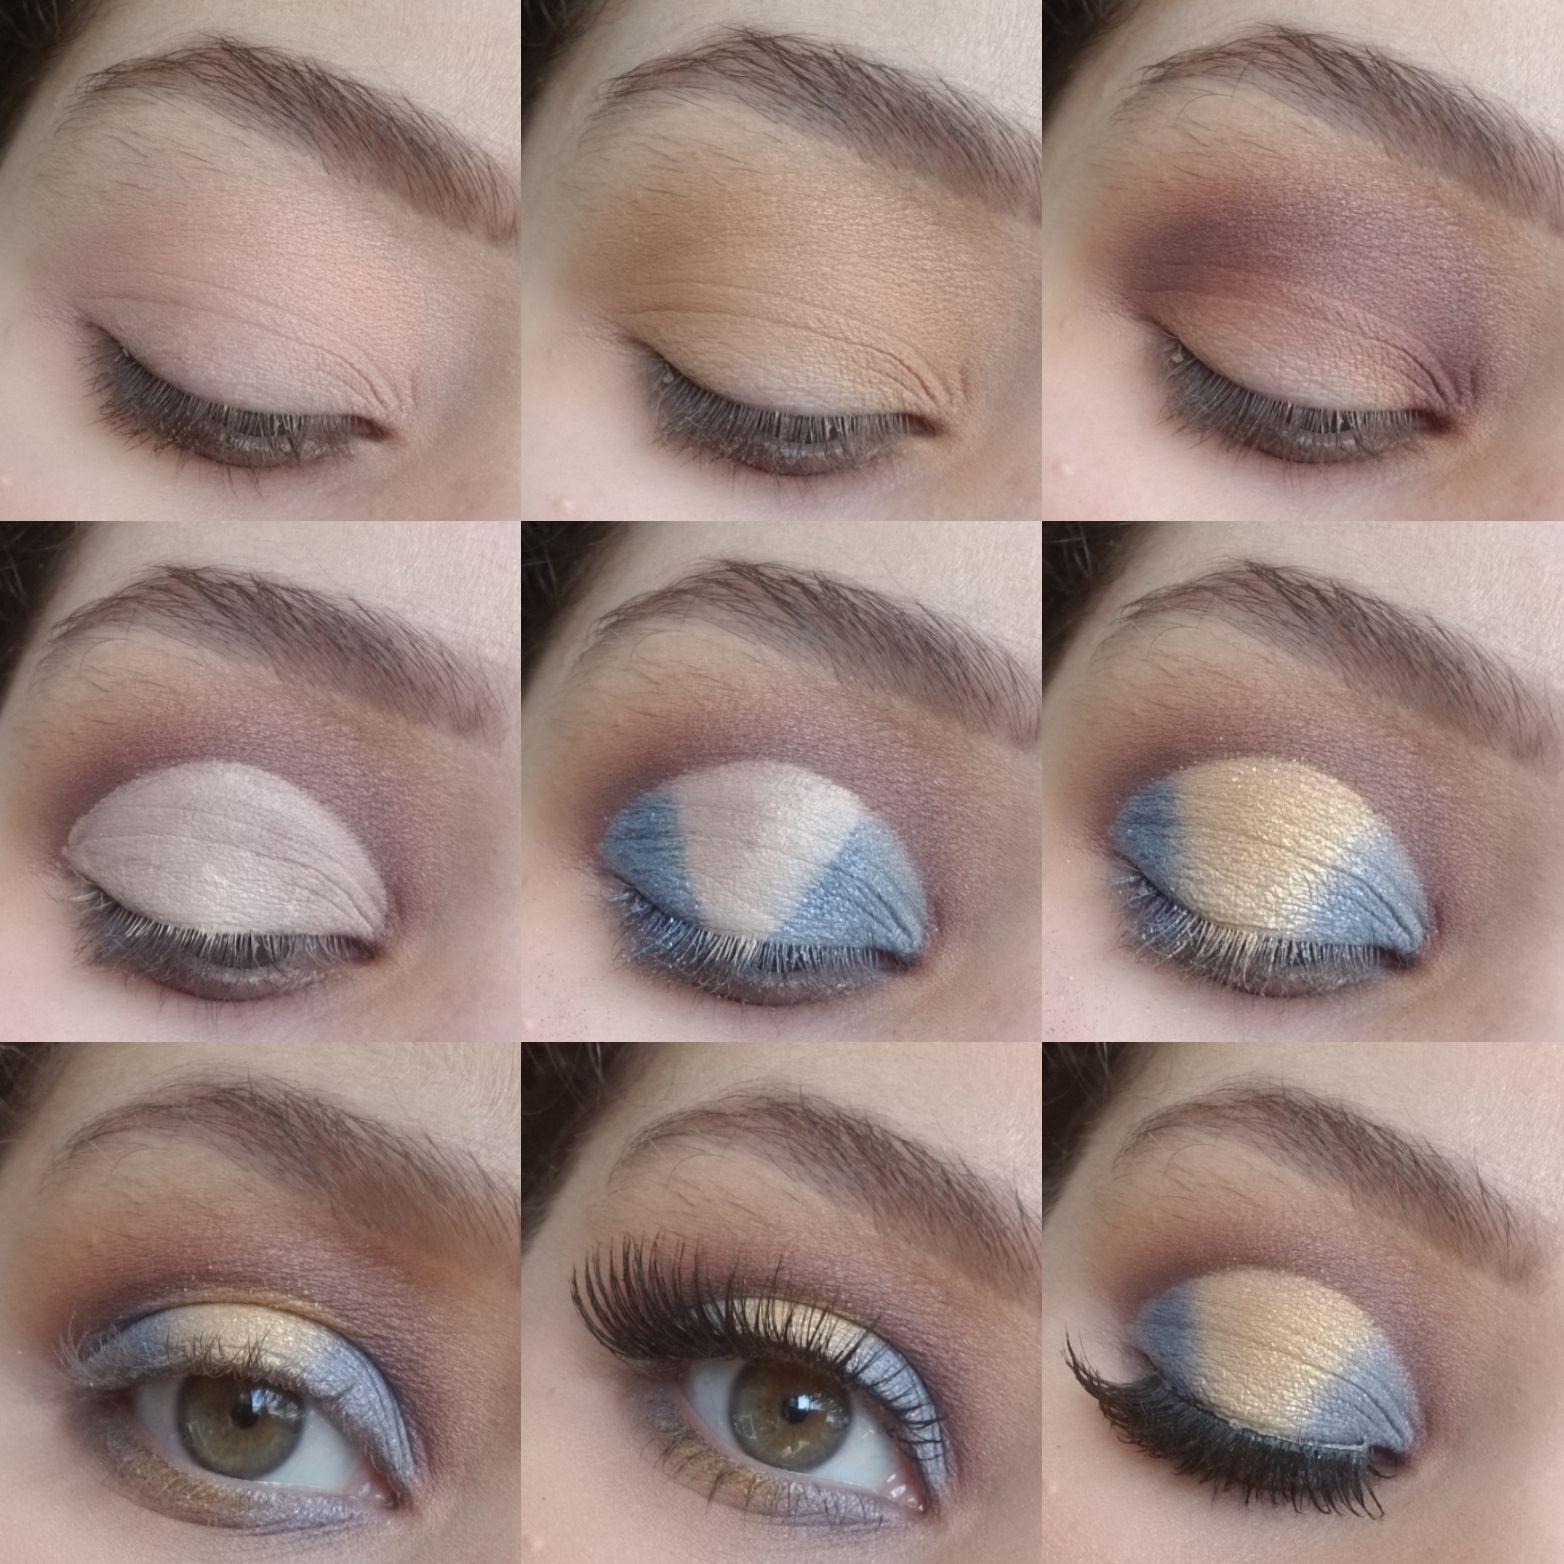 Set Sail Halo Makeup Picture Tutorial Halo eye makeup